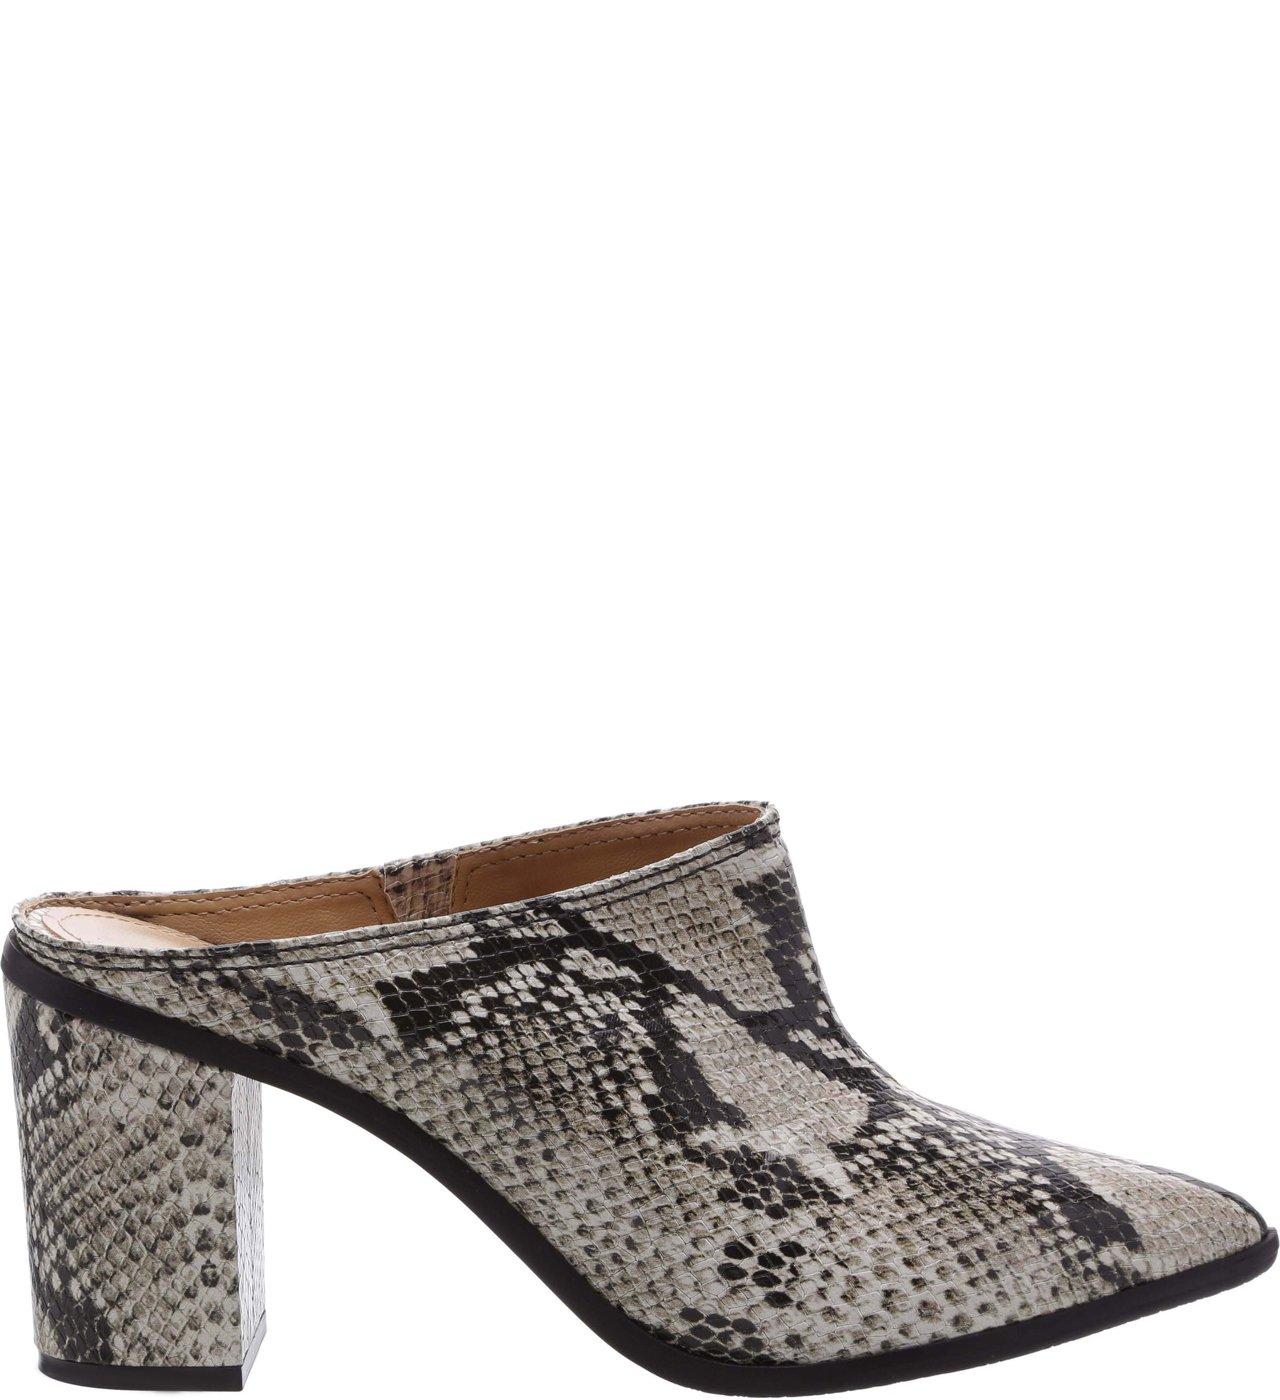 Mule Block Heel Python | Schutz